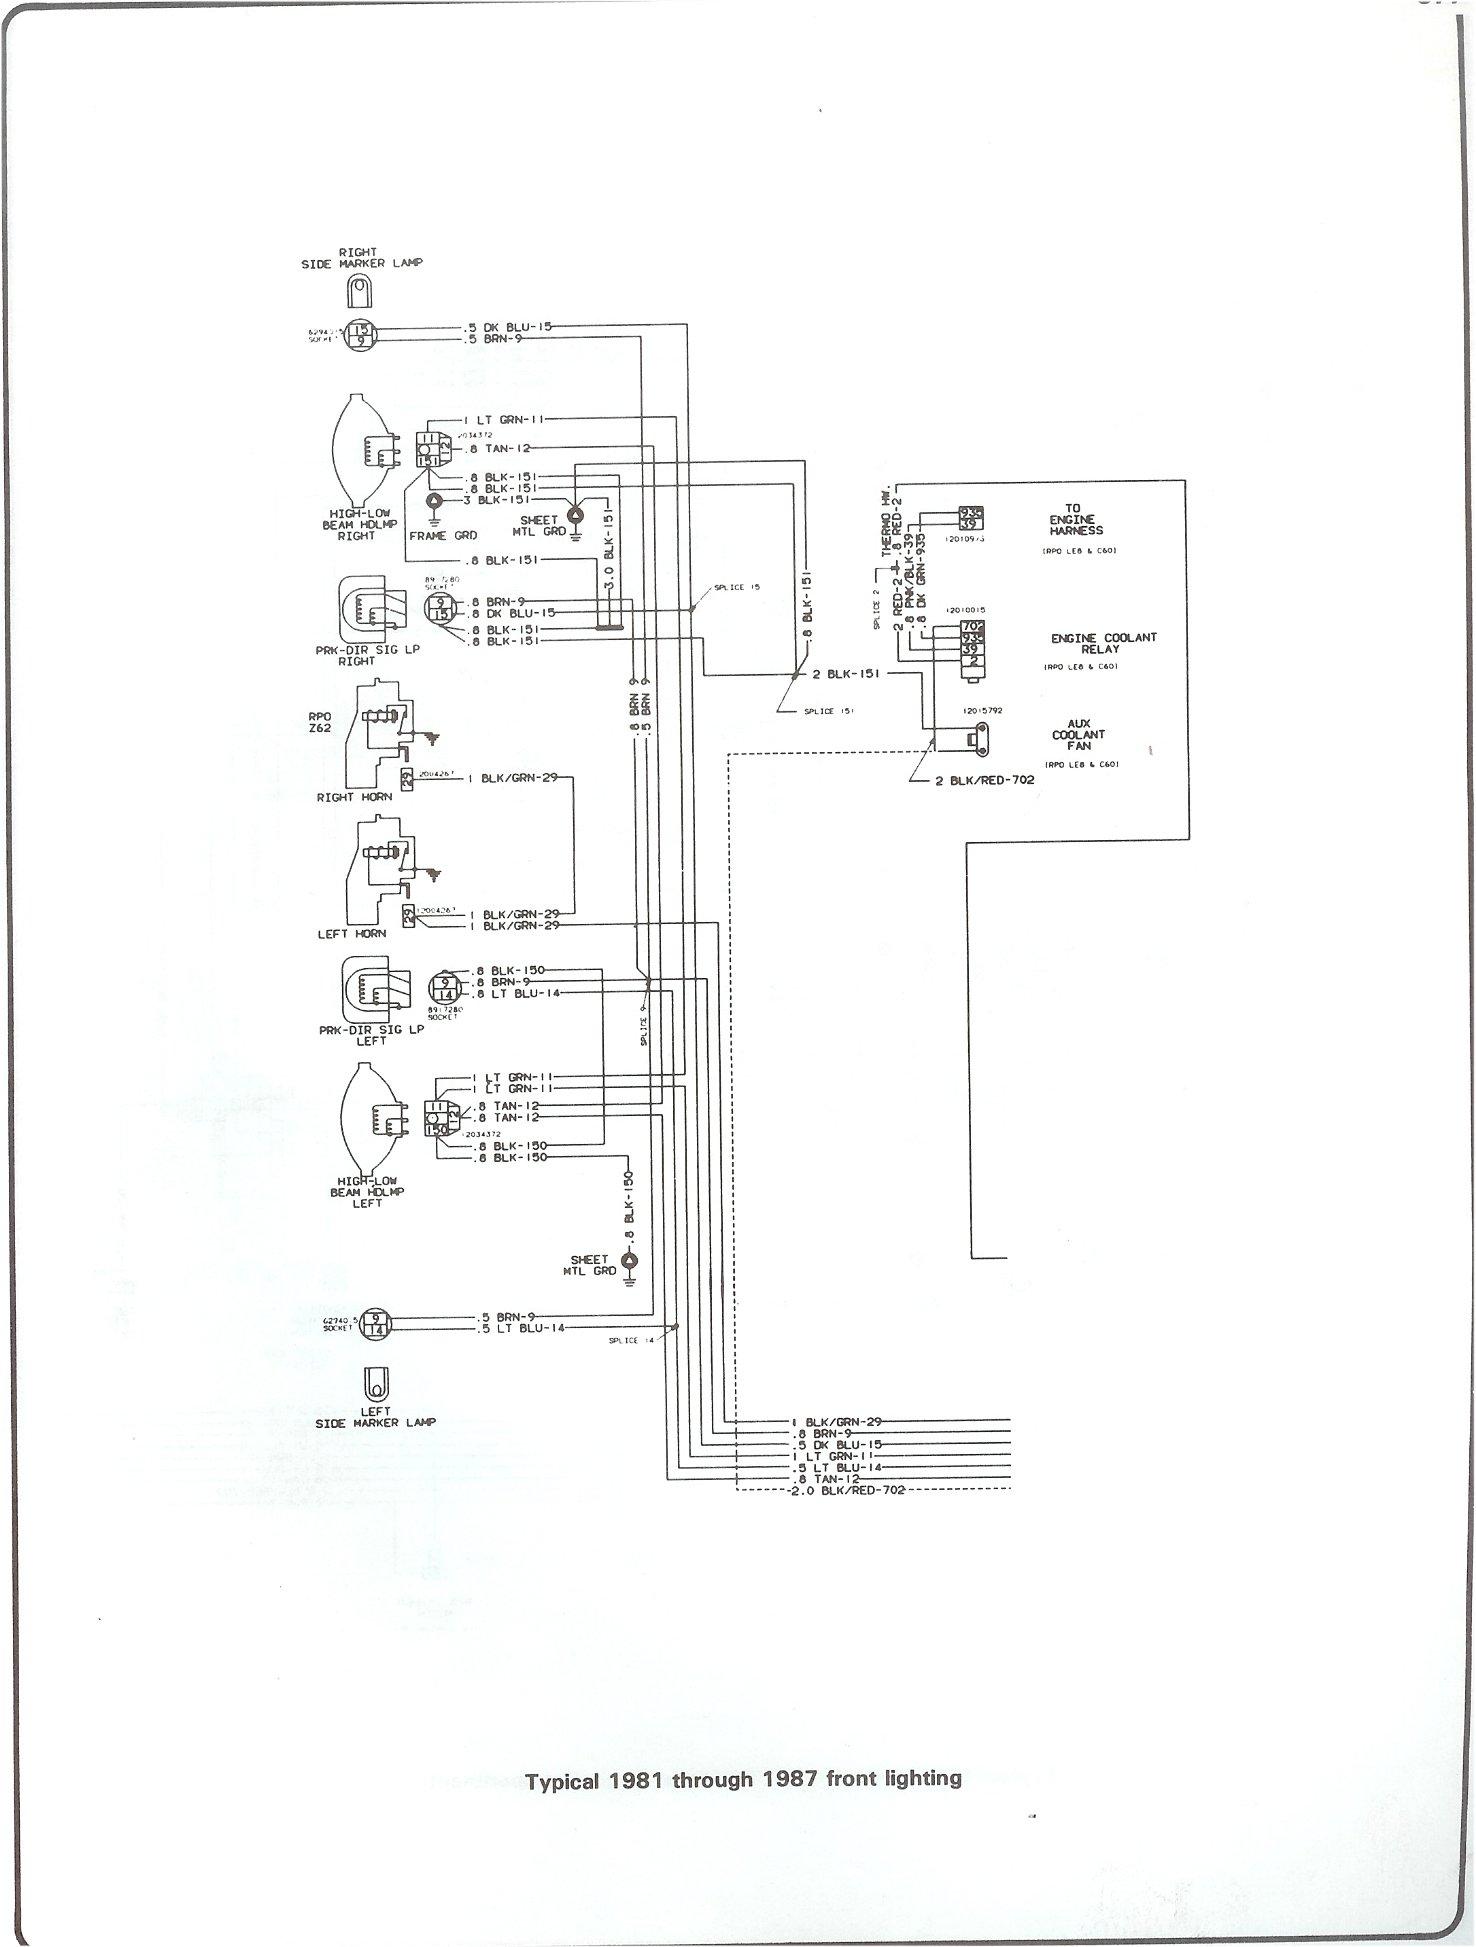 Brake Light Switch Wiring Diagram? - Blazer Forum - Chevy Blazer Forums - Brake Light Wiring Diagram